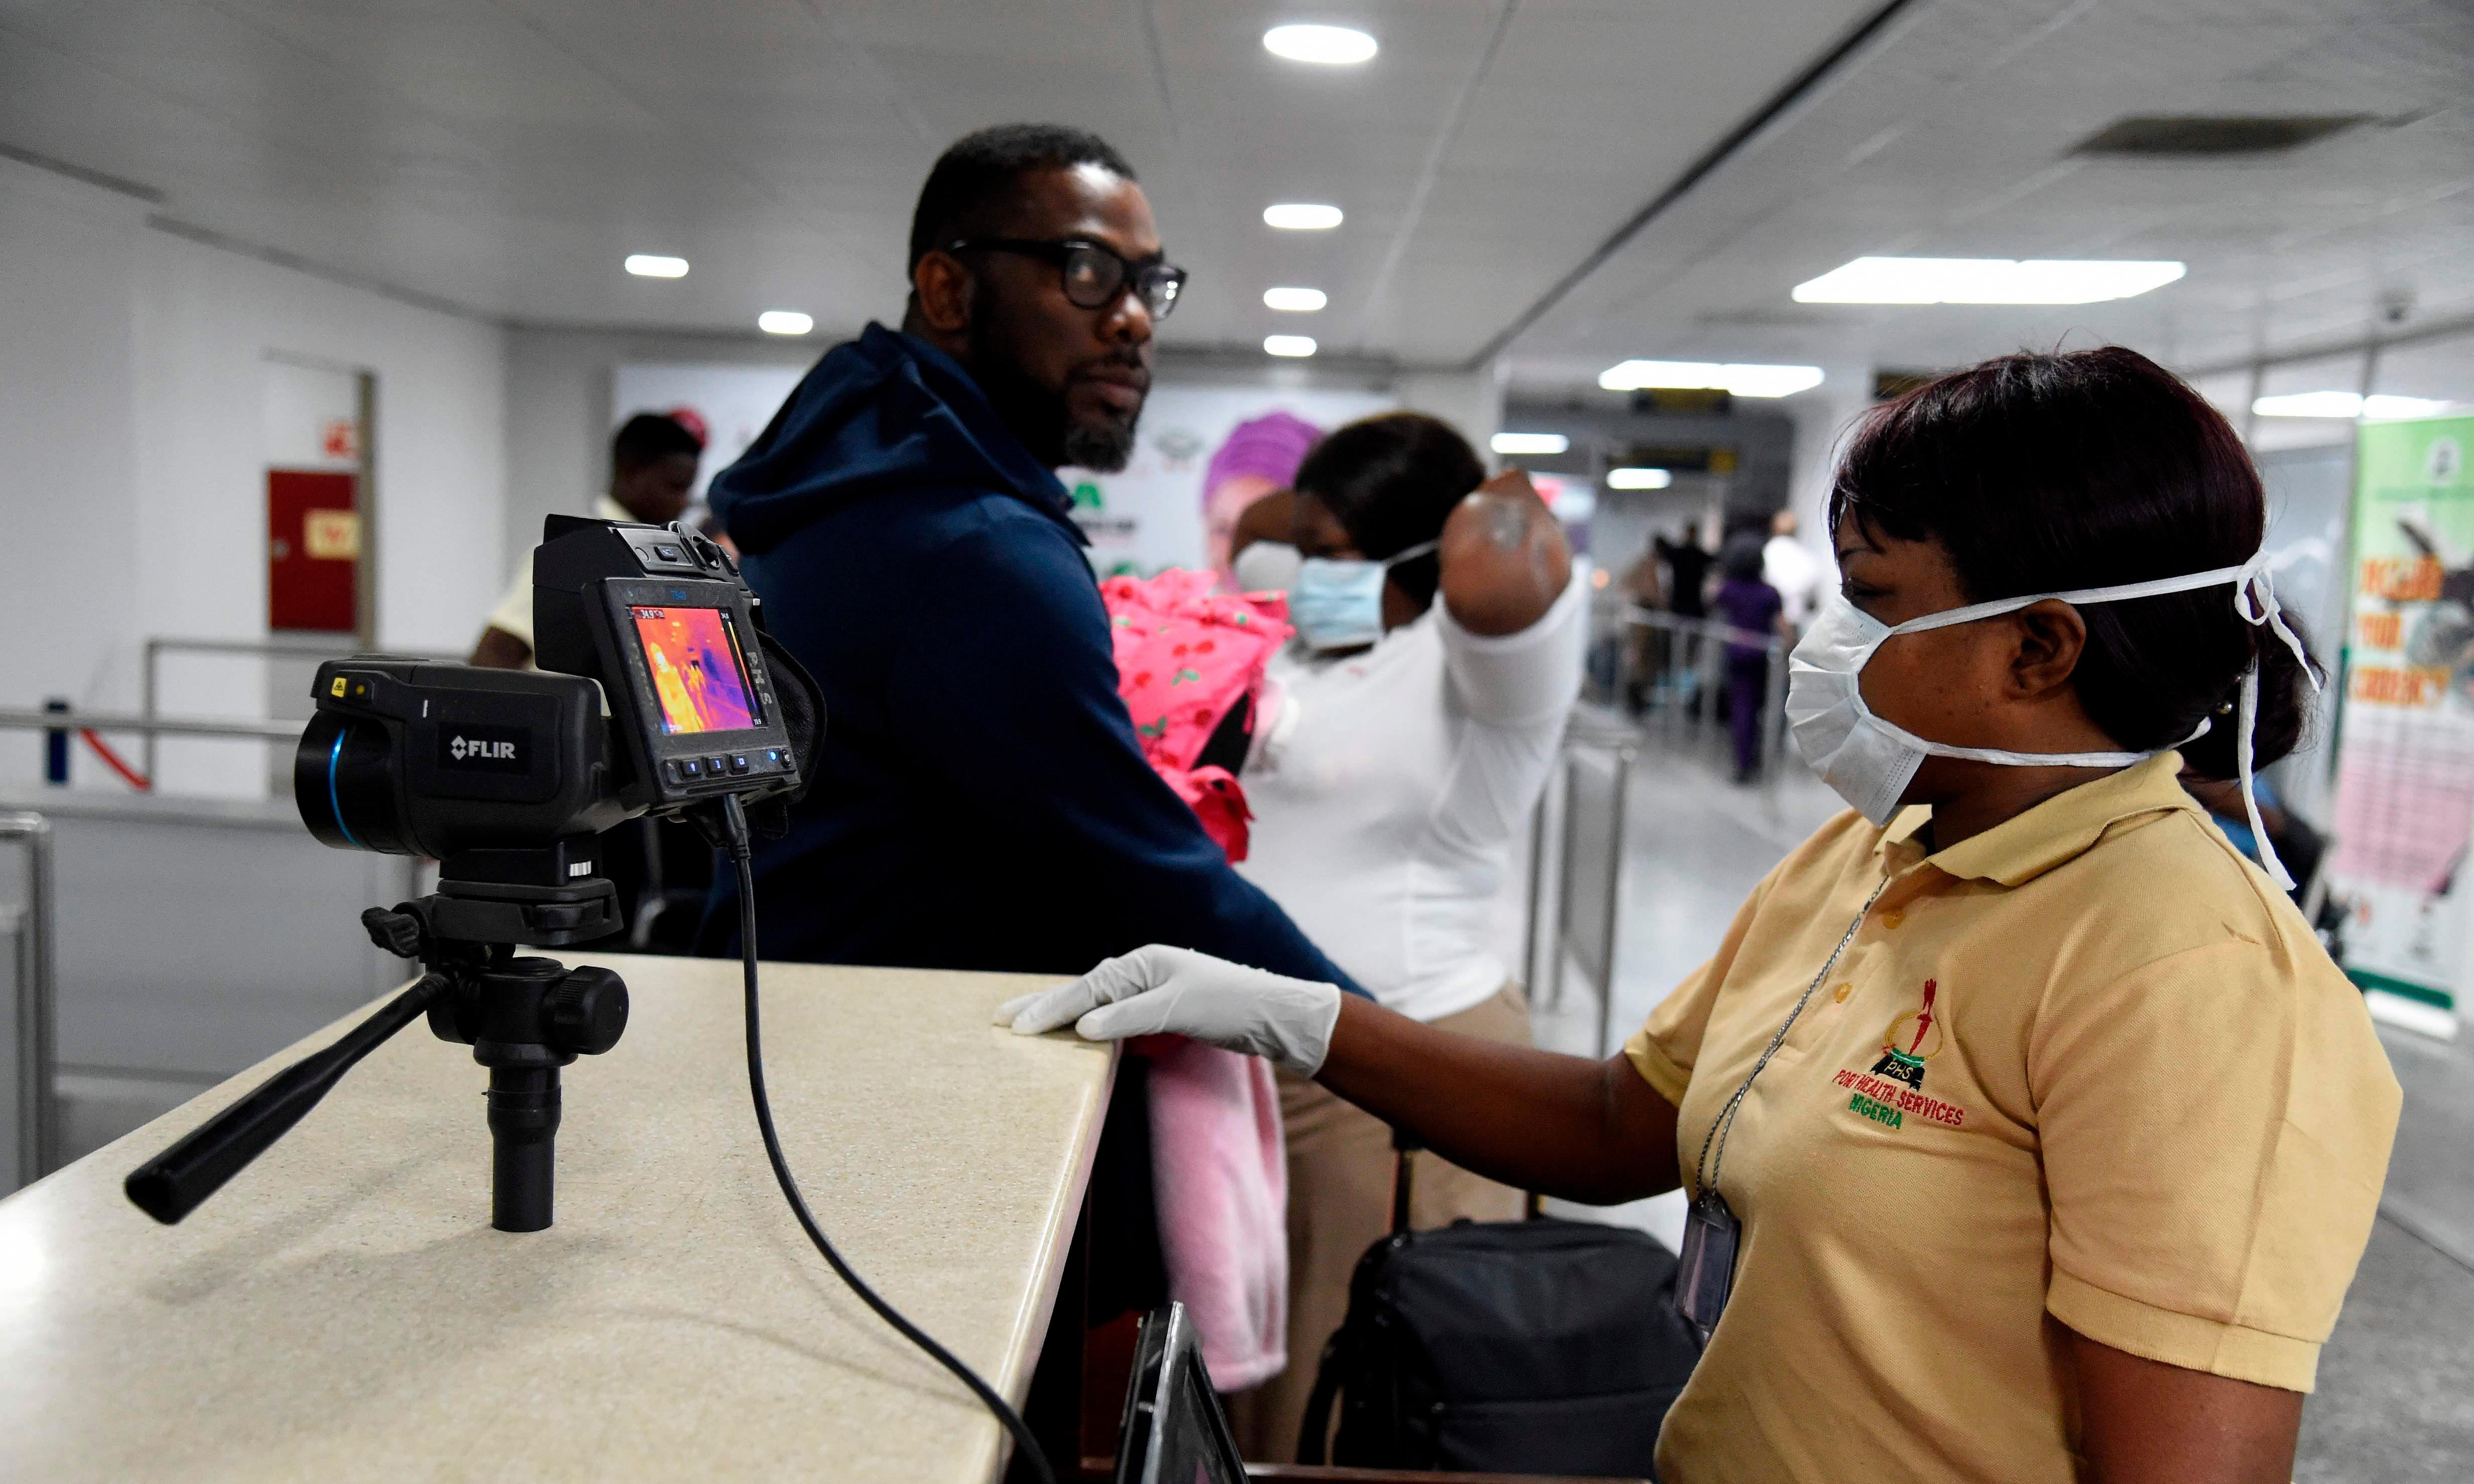 Nigeria confirms first coronavirus case in sub-Saharan Africa